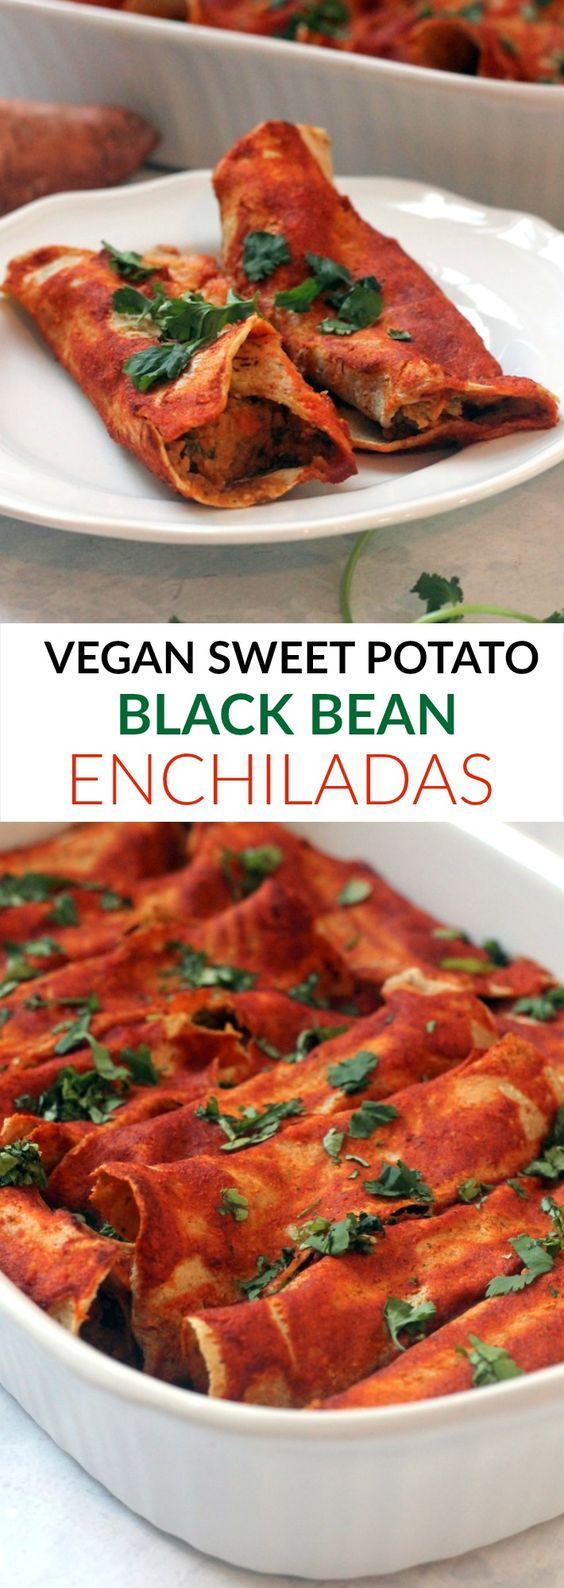 Black bean enchiladas, Bean enchiladas and Black beans on Pinterest